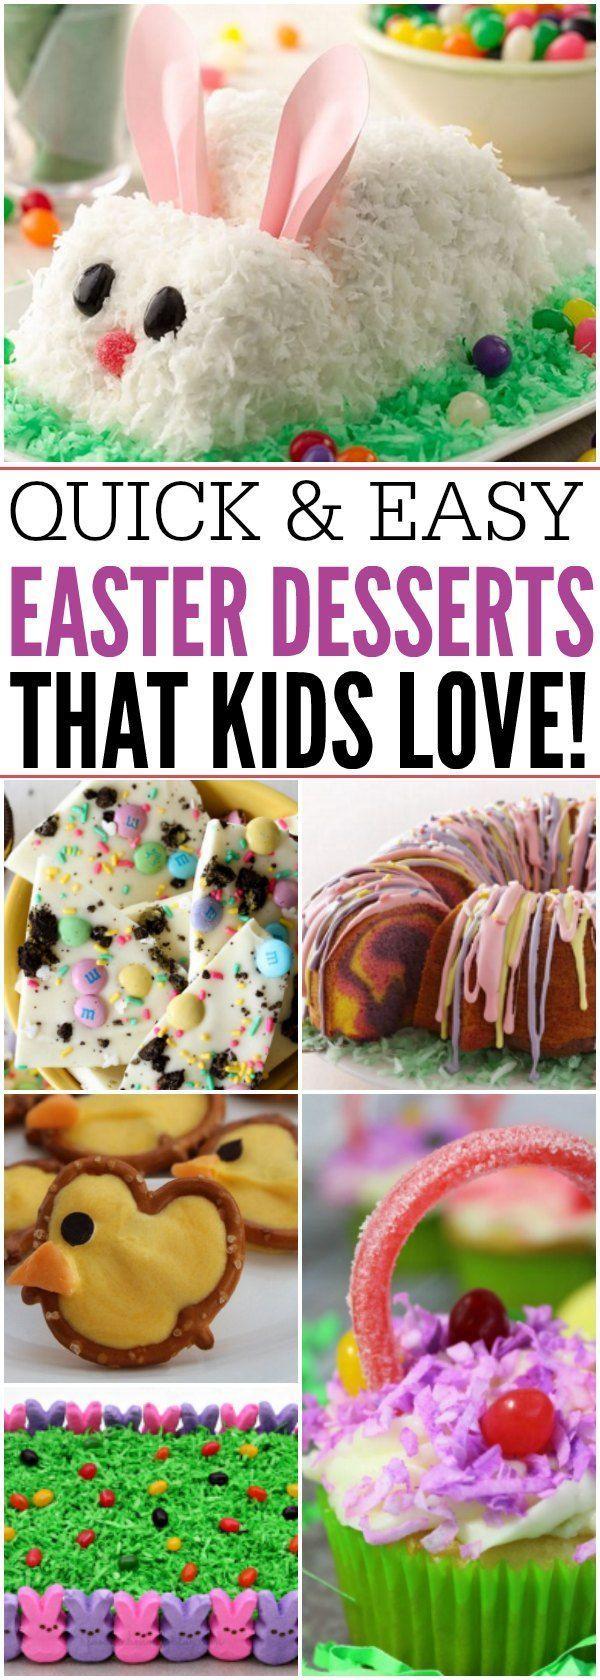 Easy Easter Desserts 21 Cute Easter Desserts For Kids Easy